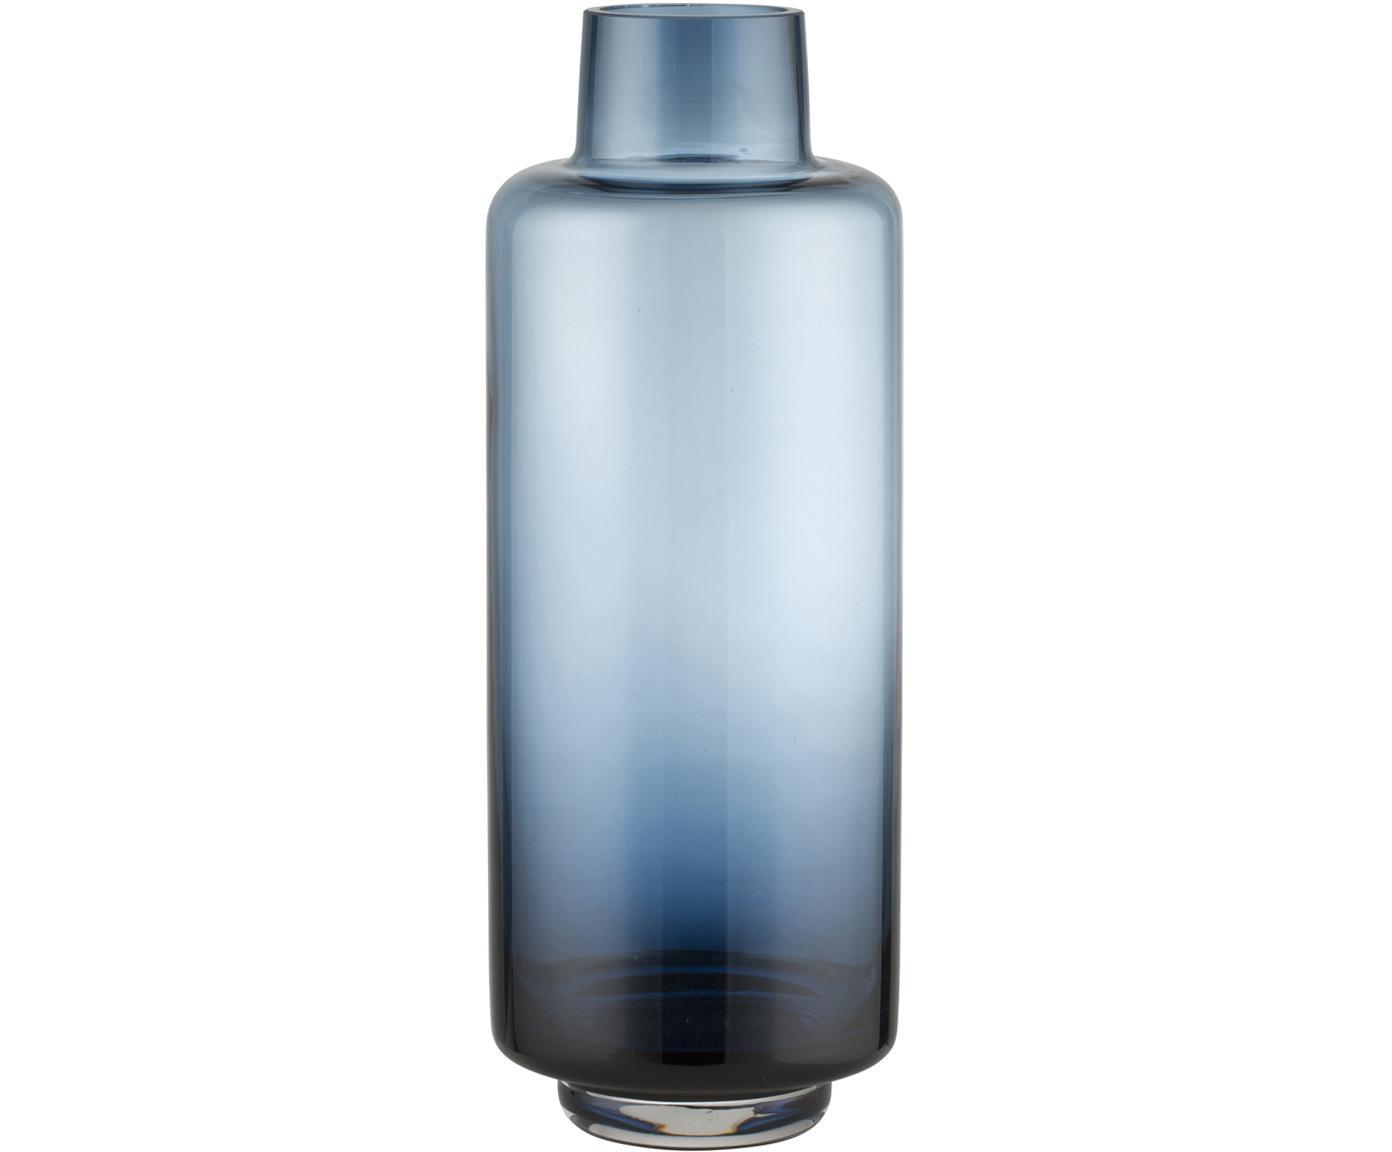 Grote mondgeblazen vaas Hedria, Glas, Blauw, Ø 11 x H 30 cm